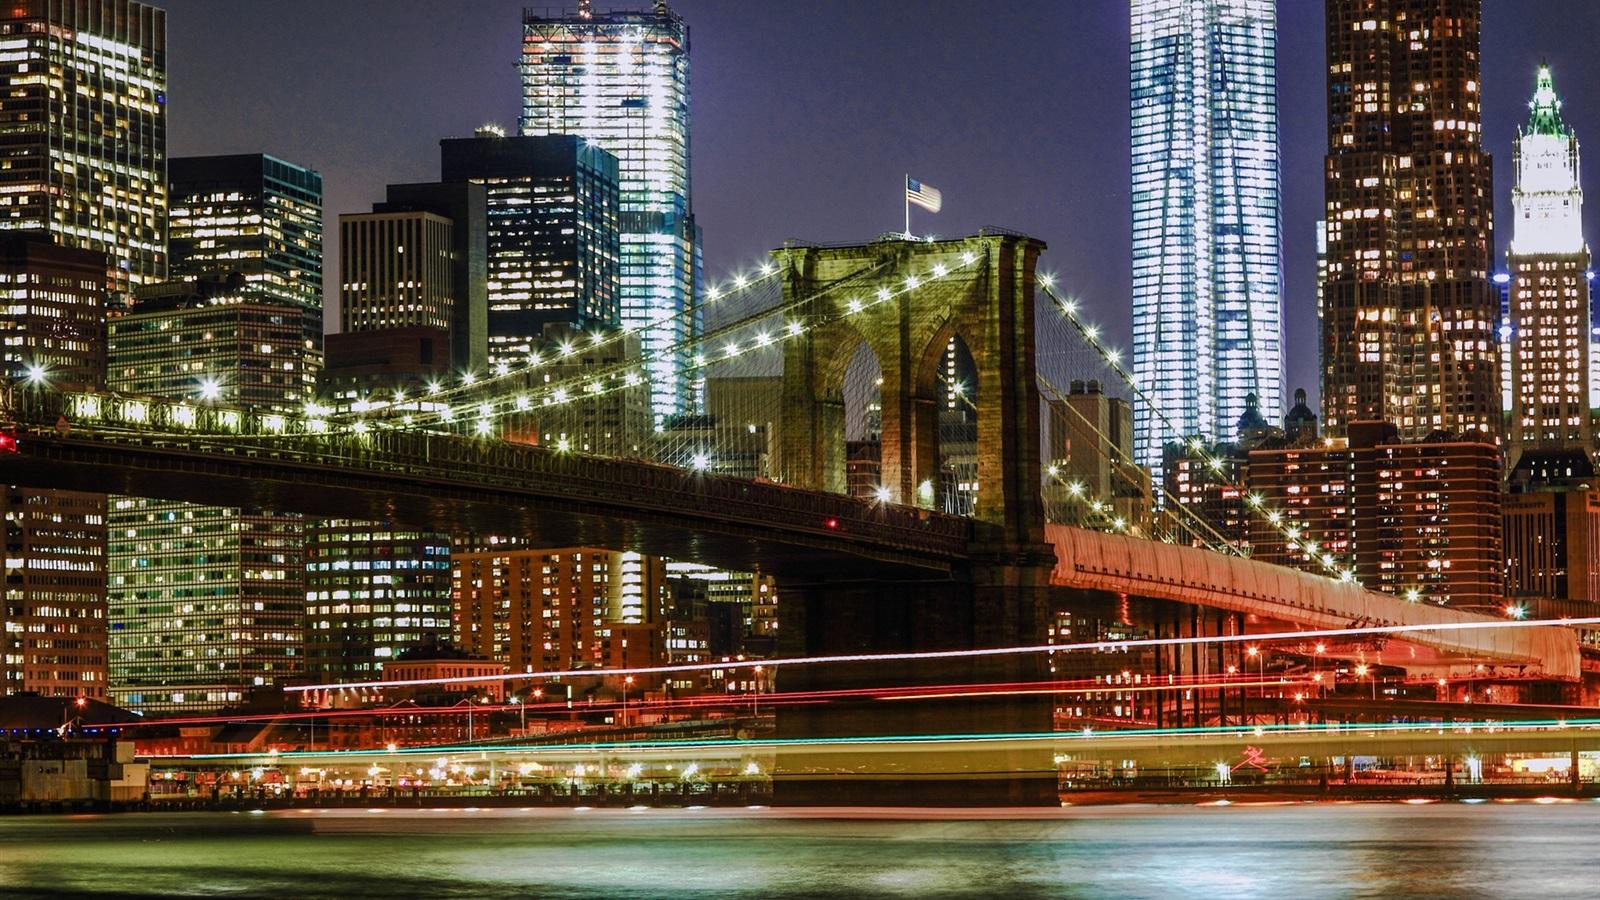 ... York, USA, city night, bridge, lights, buildings Wallpaper - 1600x900